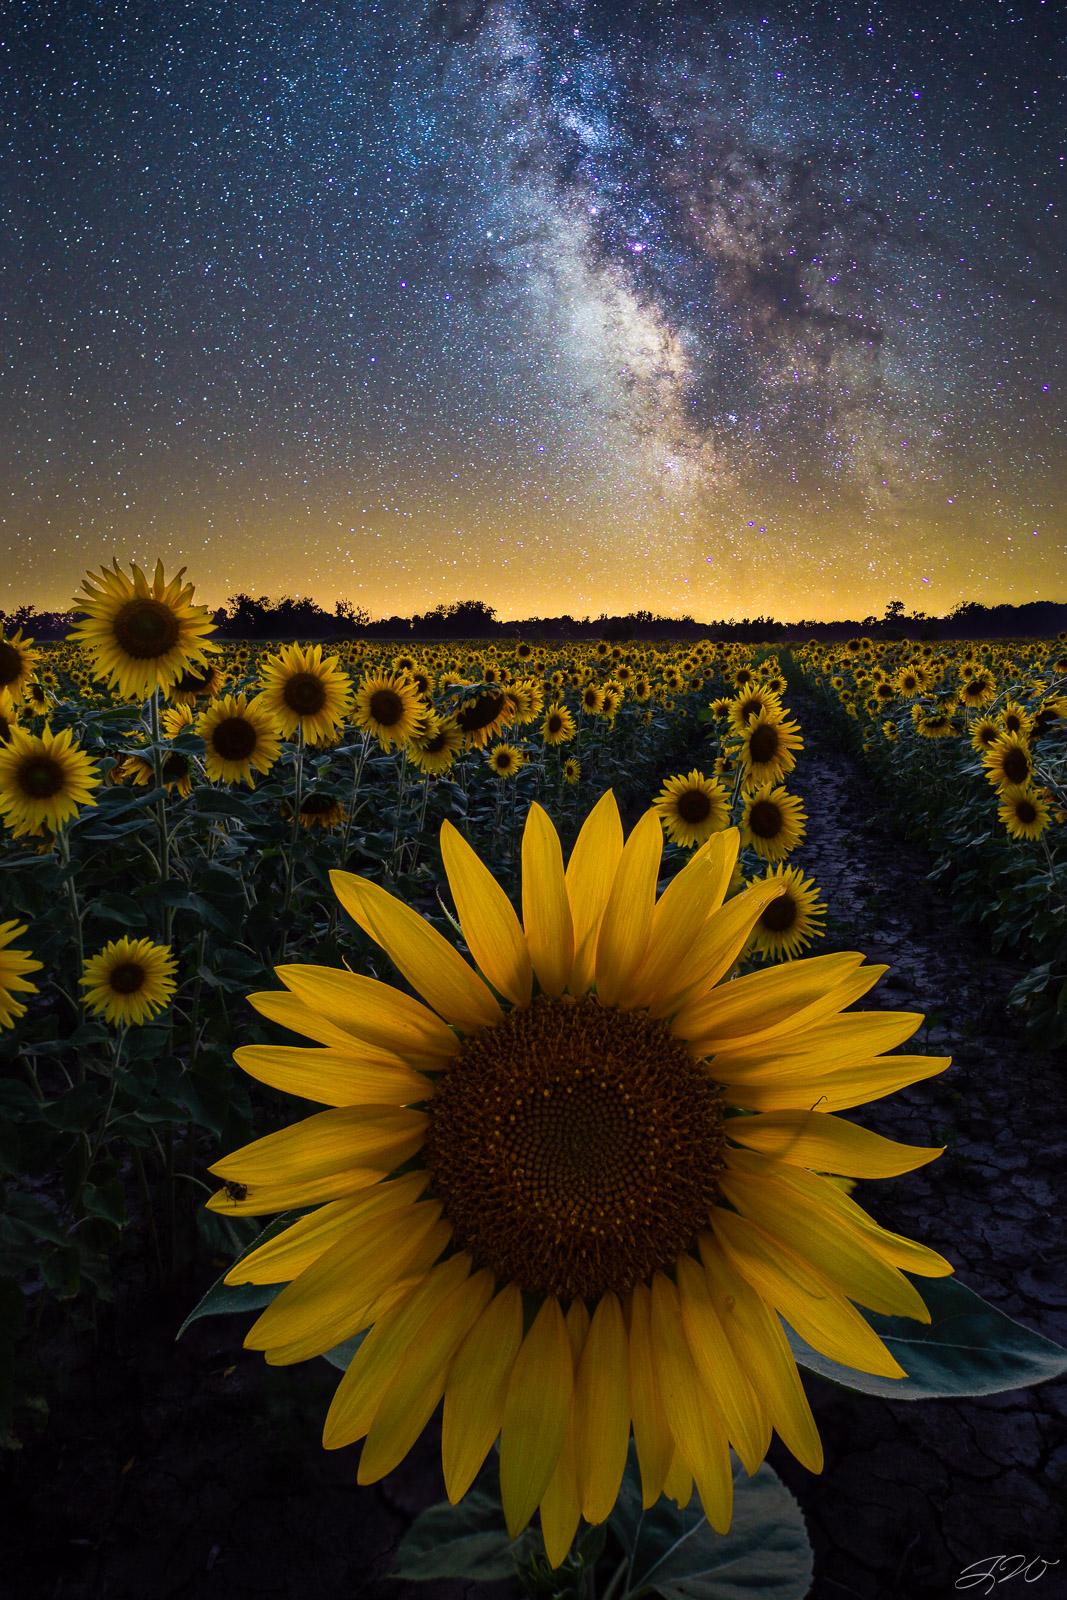 Astrophotography, Flowers, Landscape, Milky Way, Night Sky, Stars, Sunflowers, Wildflowers, photo